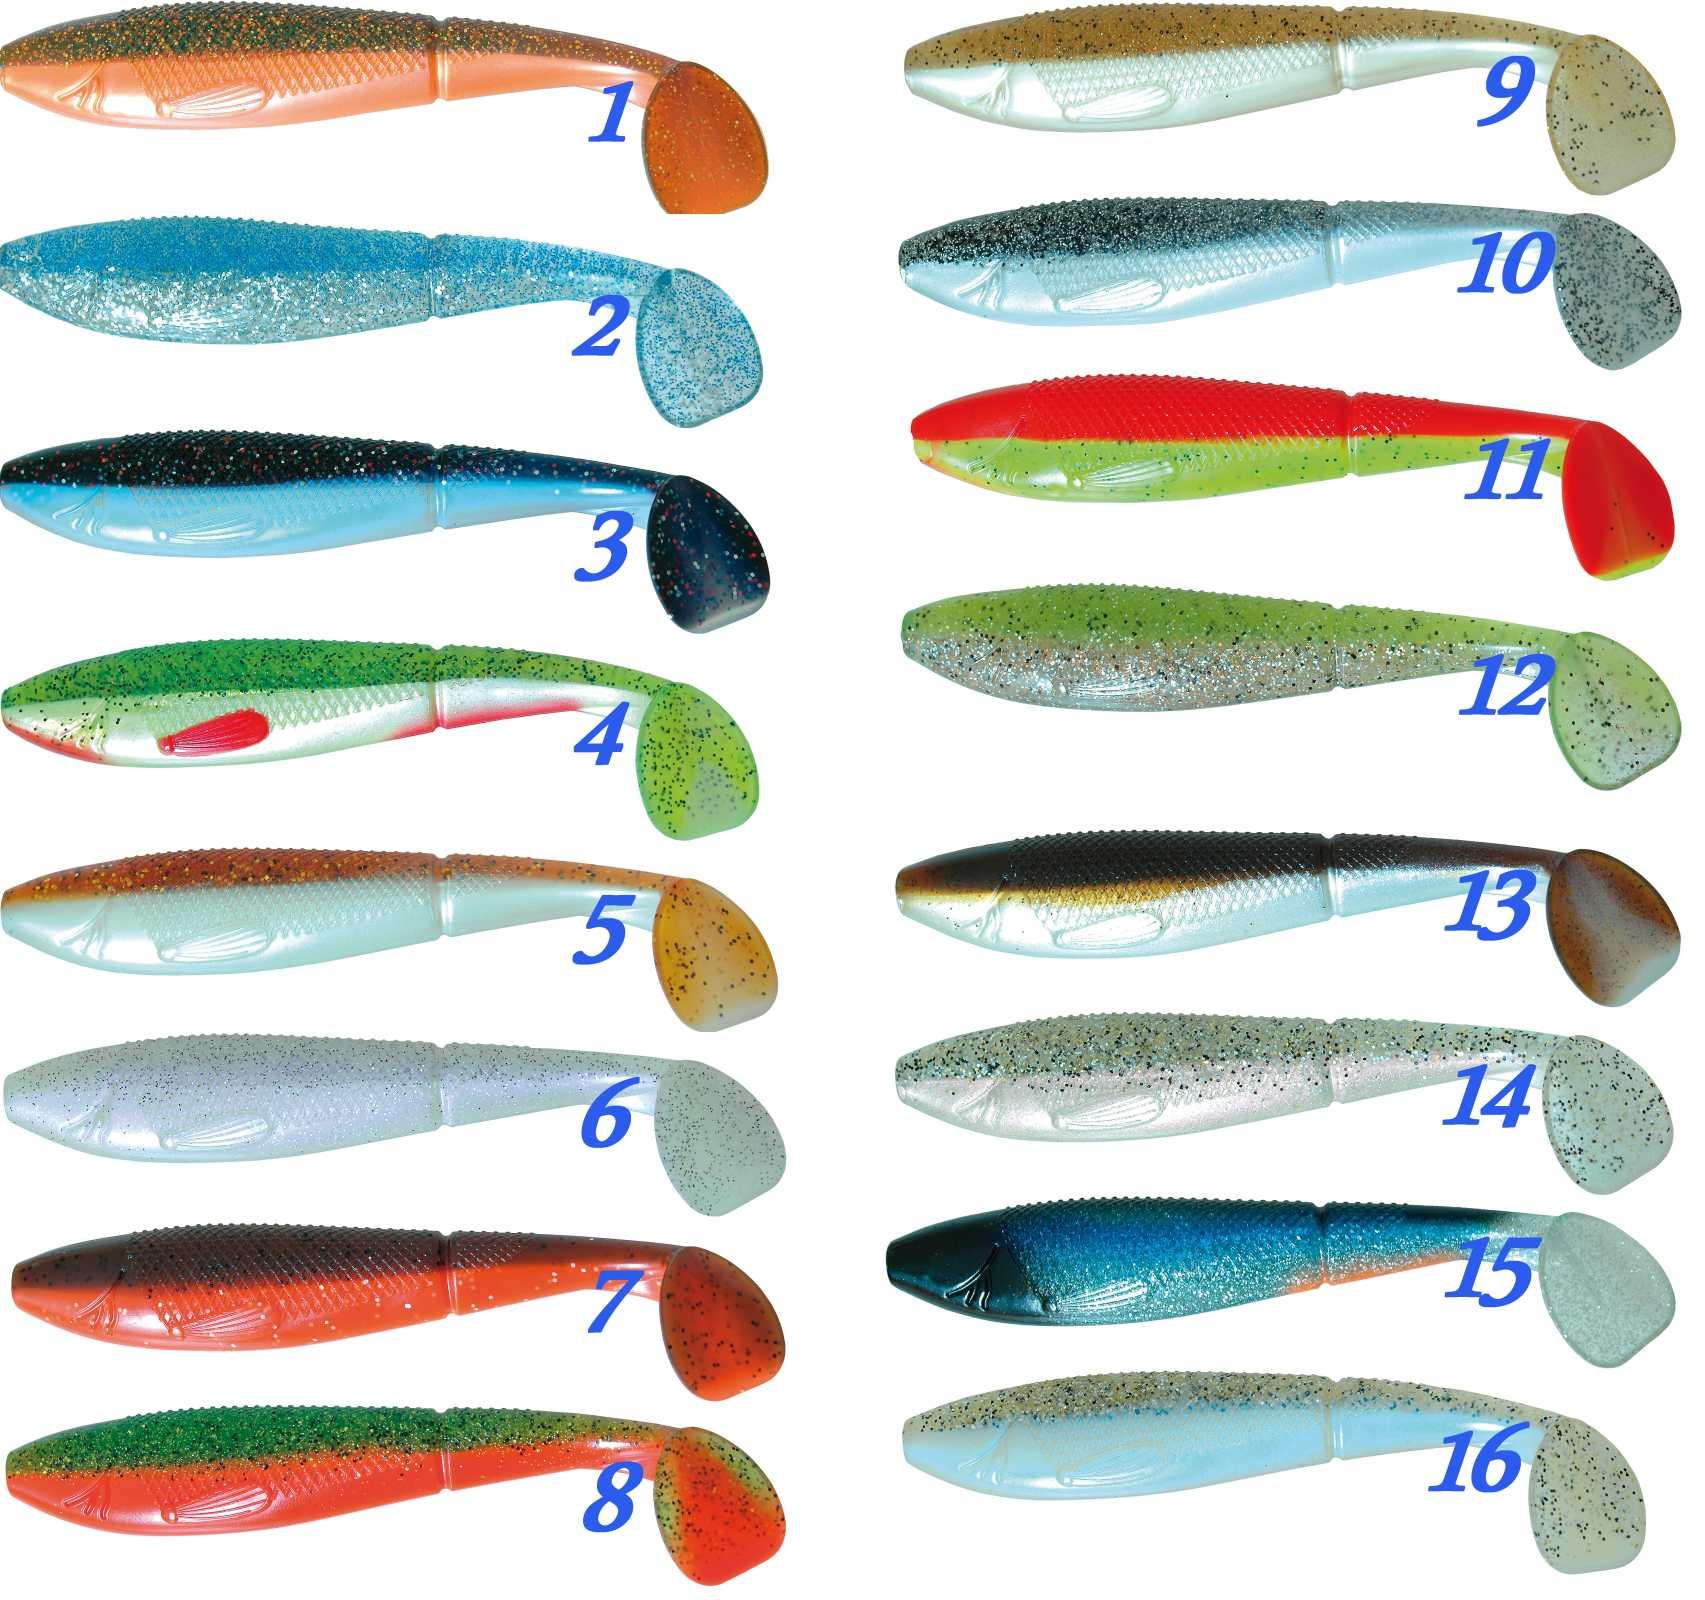 Gumová nástraha Atoka Scaler 12cm / 2ks rybí aroma, riper - zvìtšit obrázek